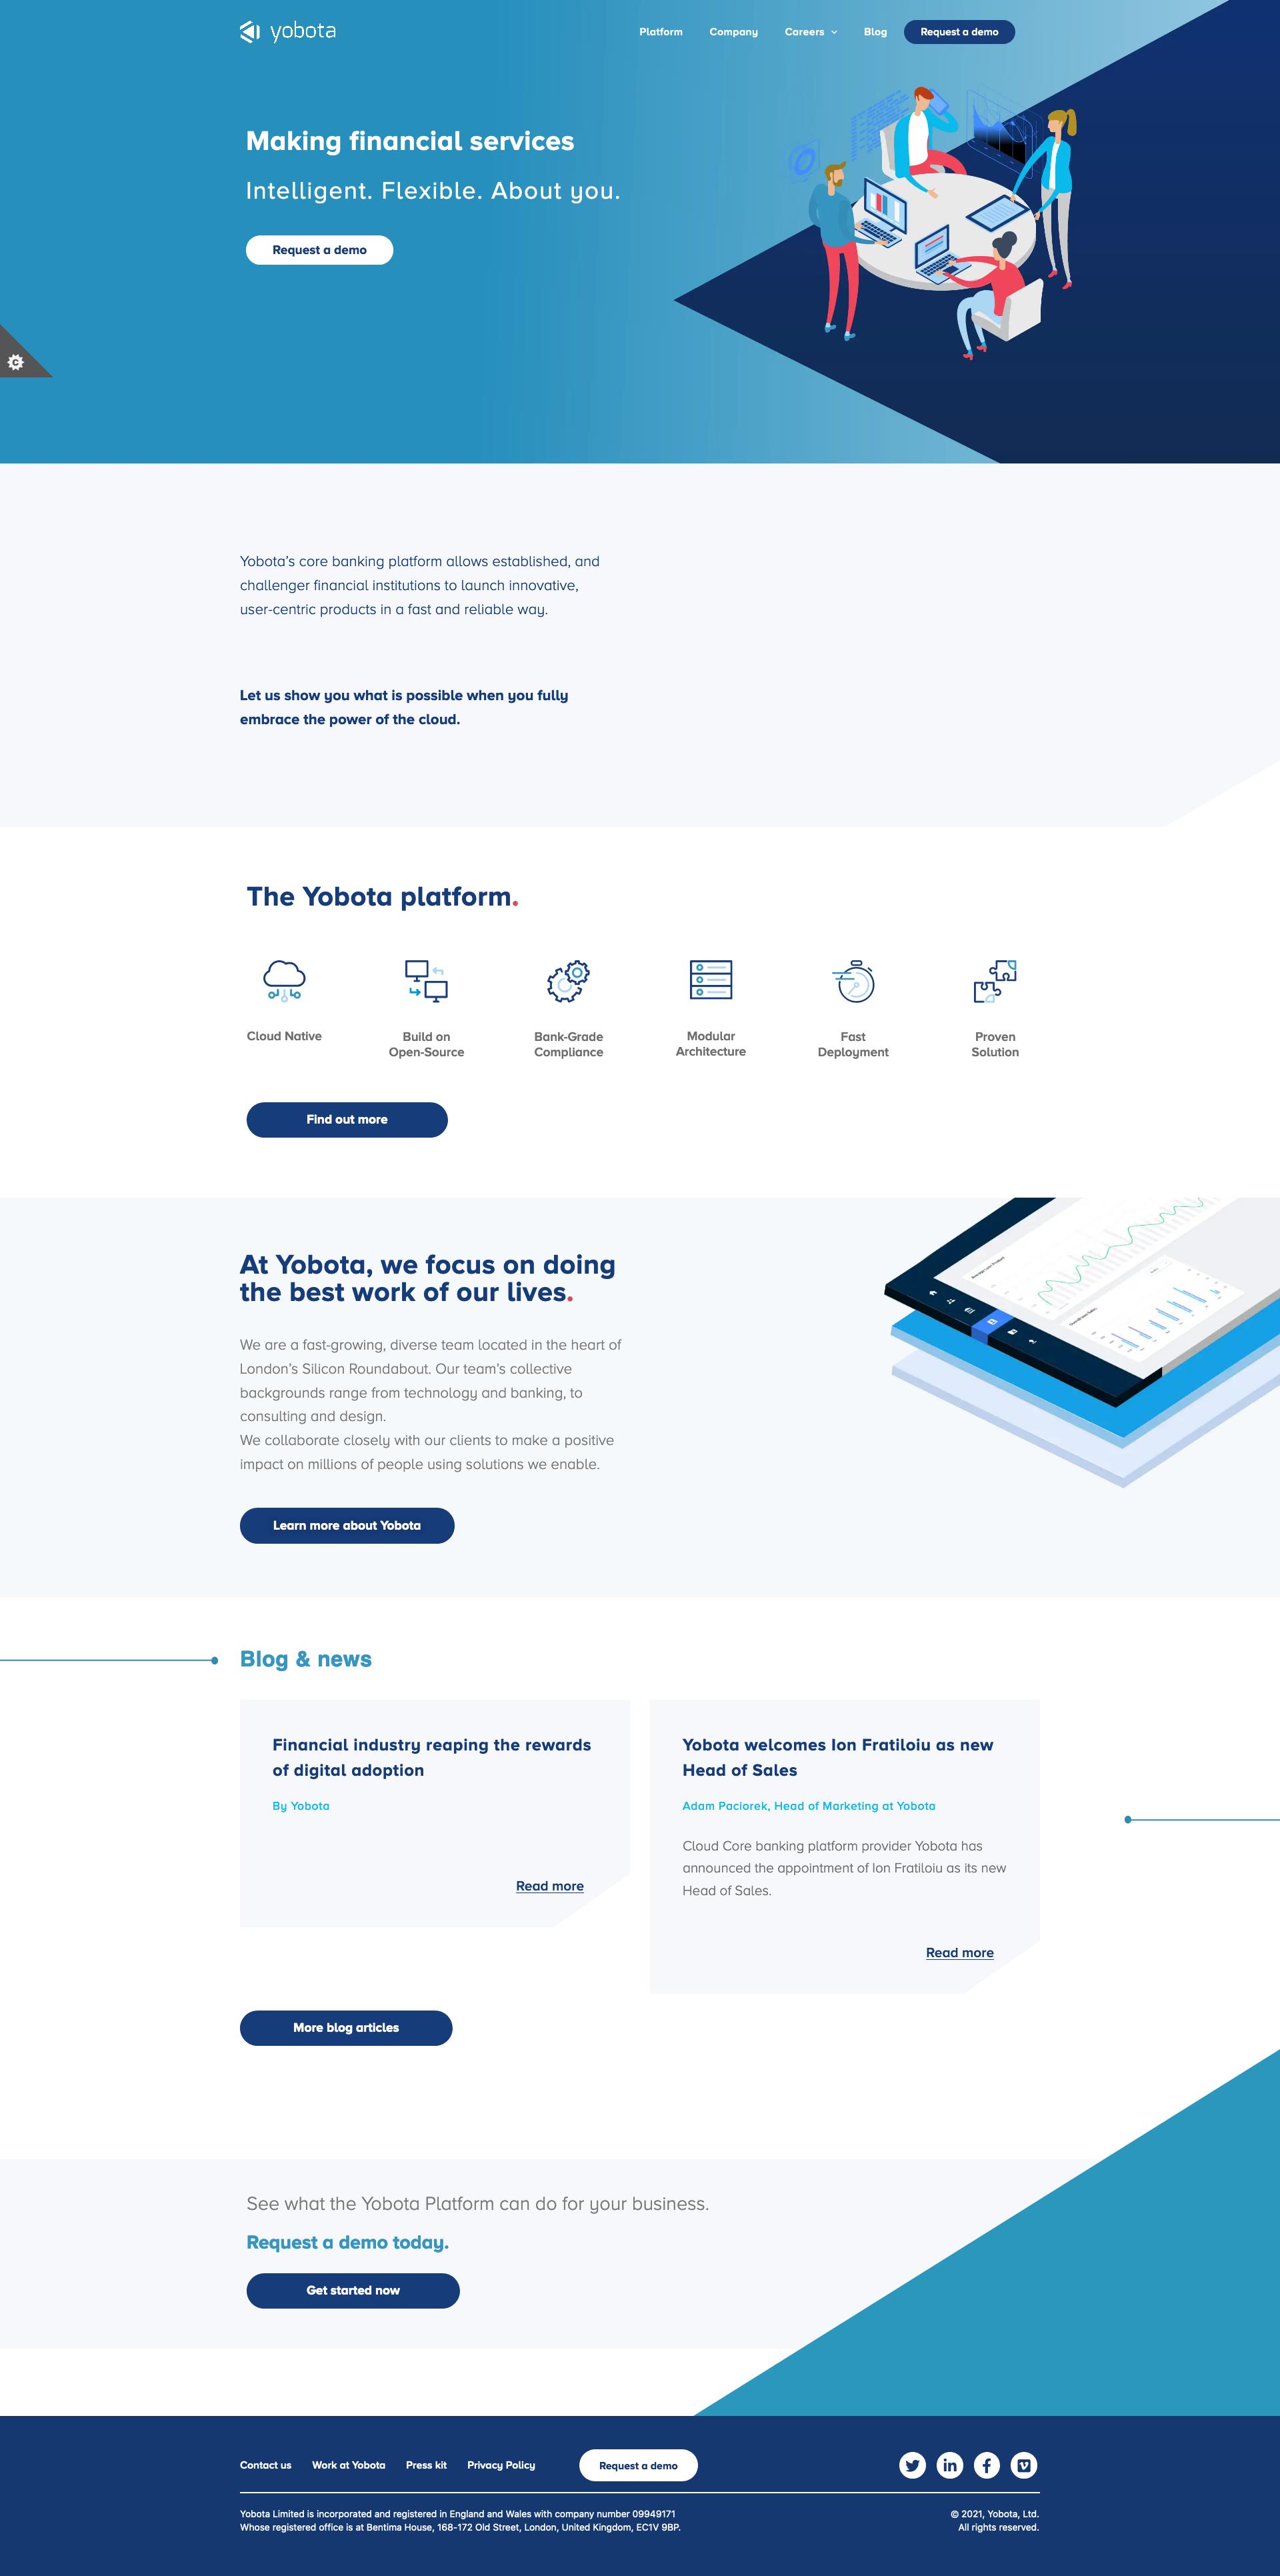 yobota-financial-services-online-lab-web-development-services-lisbon-europe-corporate-website-web-studio-web-agency